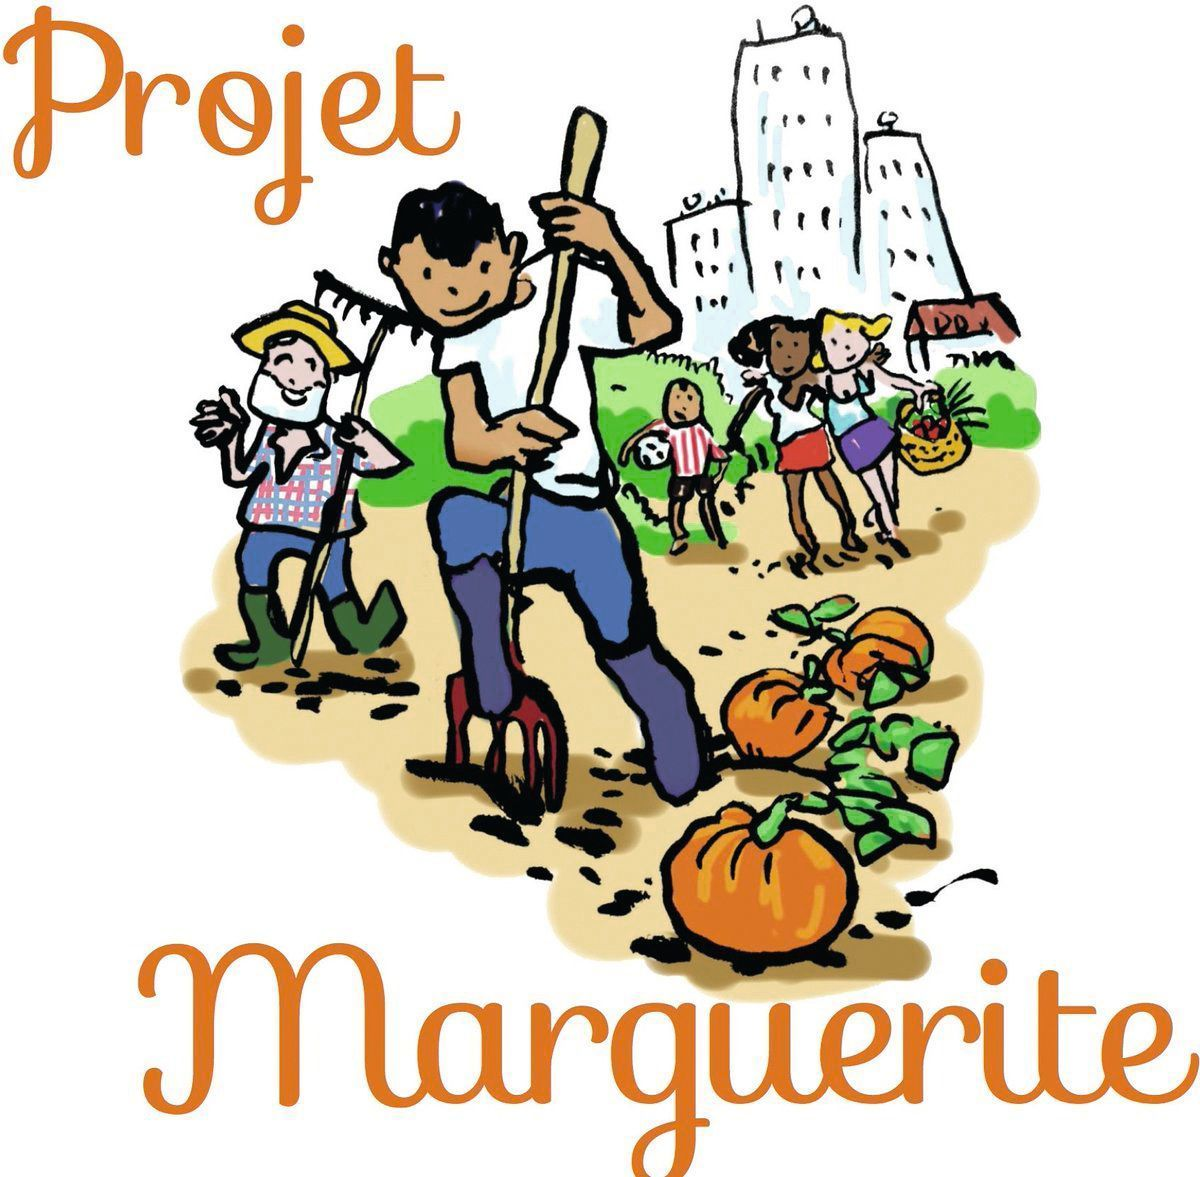 Projet marguerite